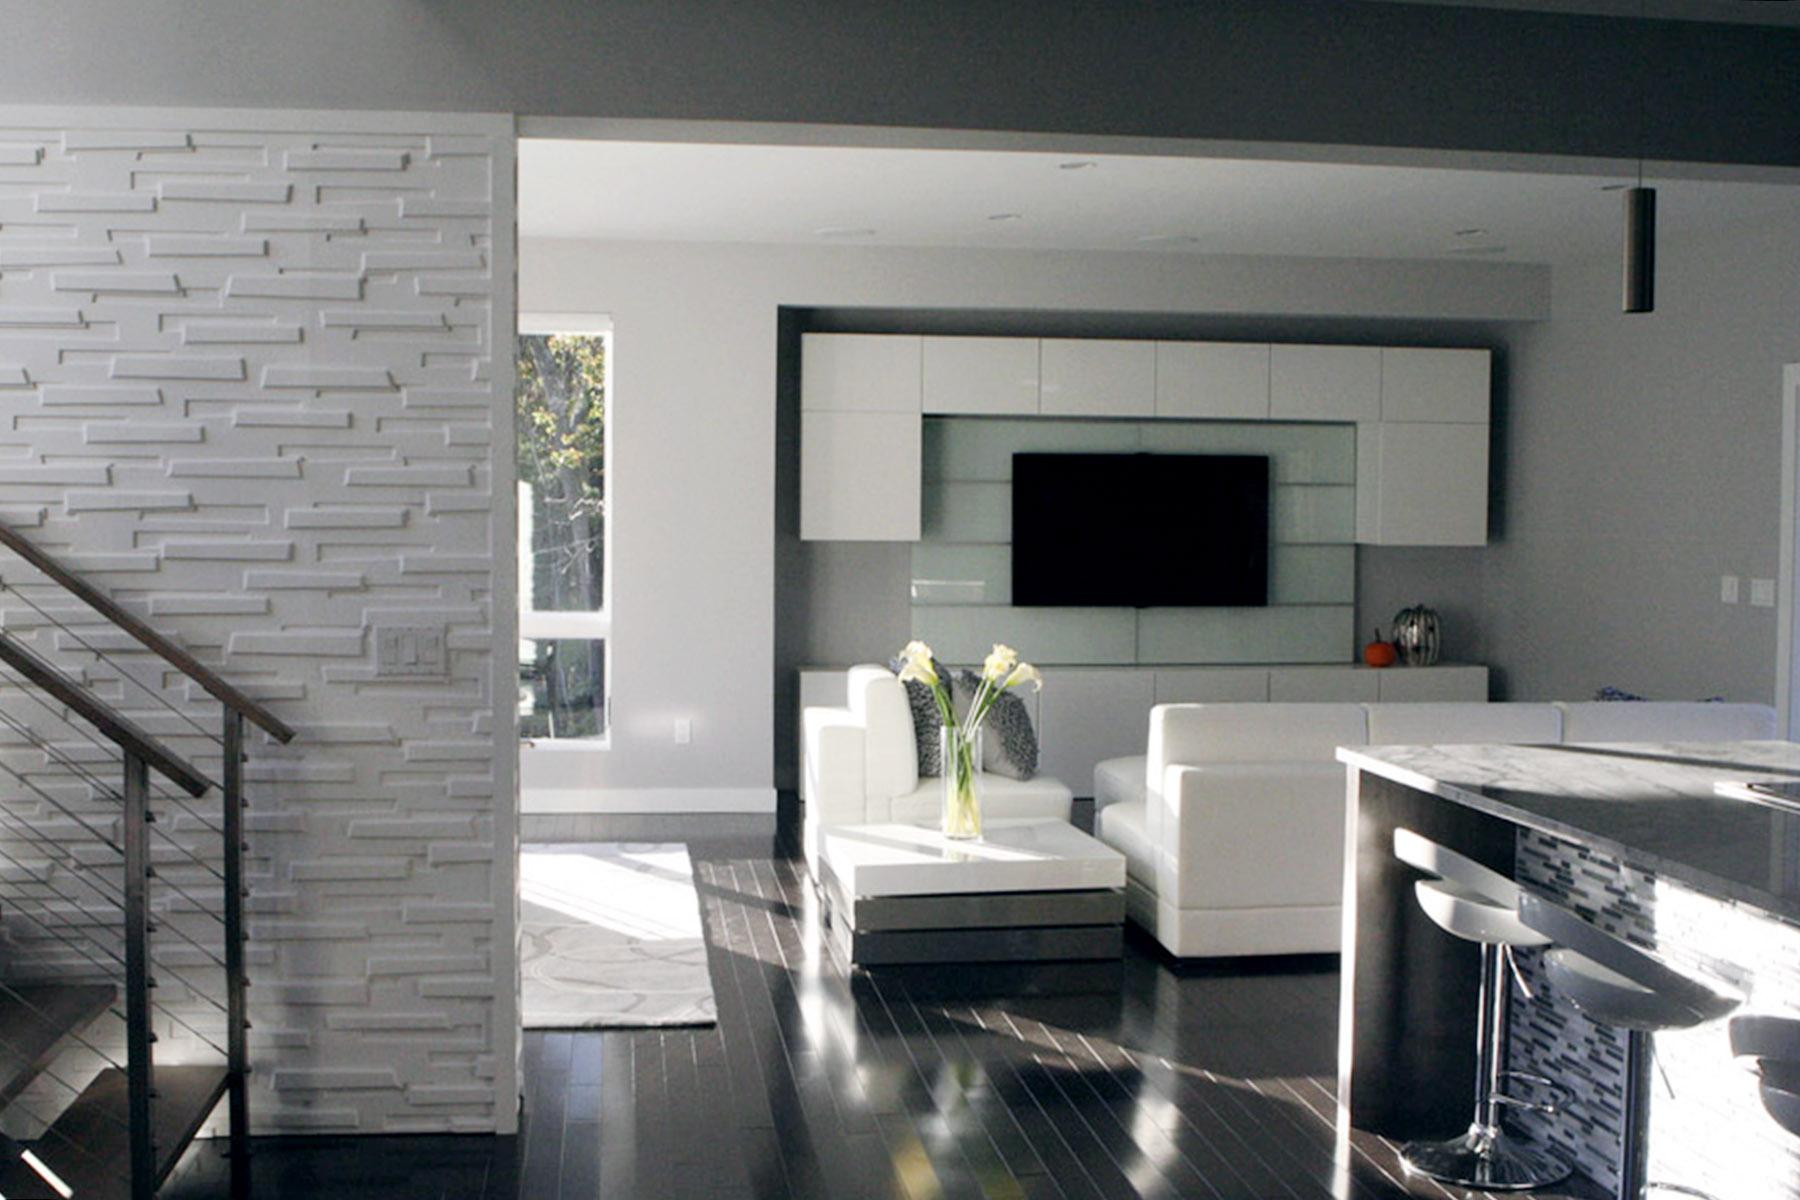 Hanoian / 2012   Single-Family Residential New Construction